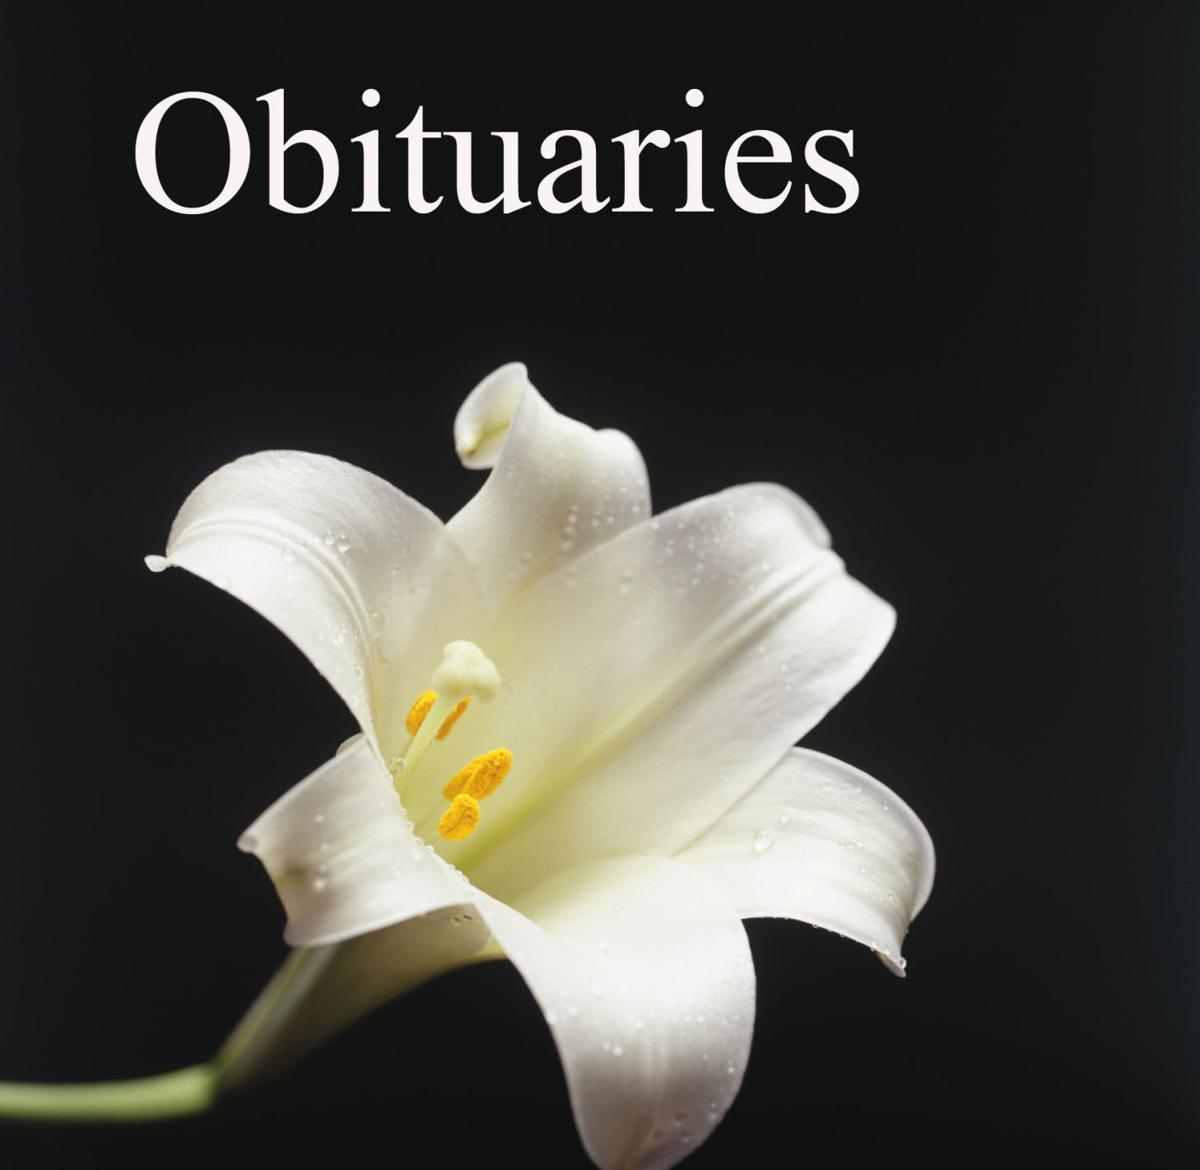 Funerals today for april 22 2018 obituaries herald review funerals today for april 22 2018 izmirmasajfo